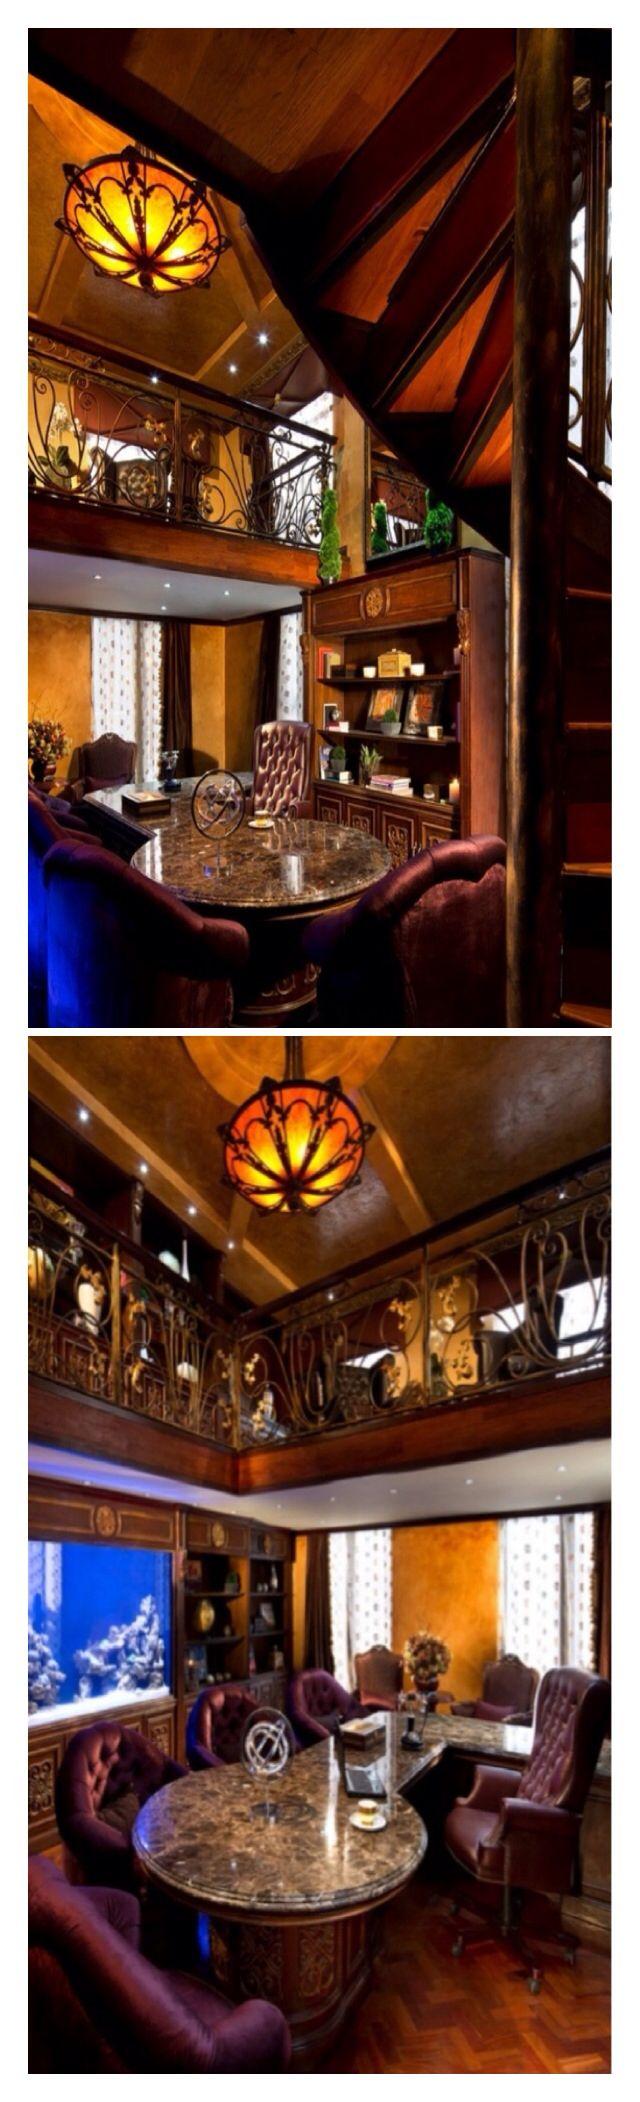 elegant home interiors. Luxury Home Interiors  Entertaining 1841 best Decor images on Pinterest Tuscan decorating